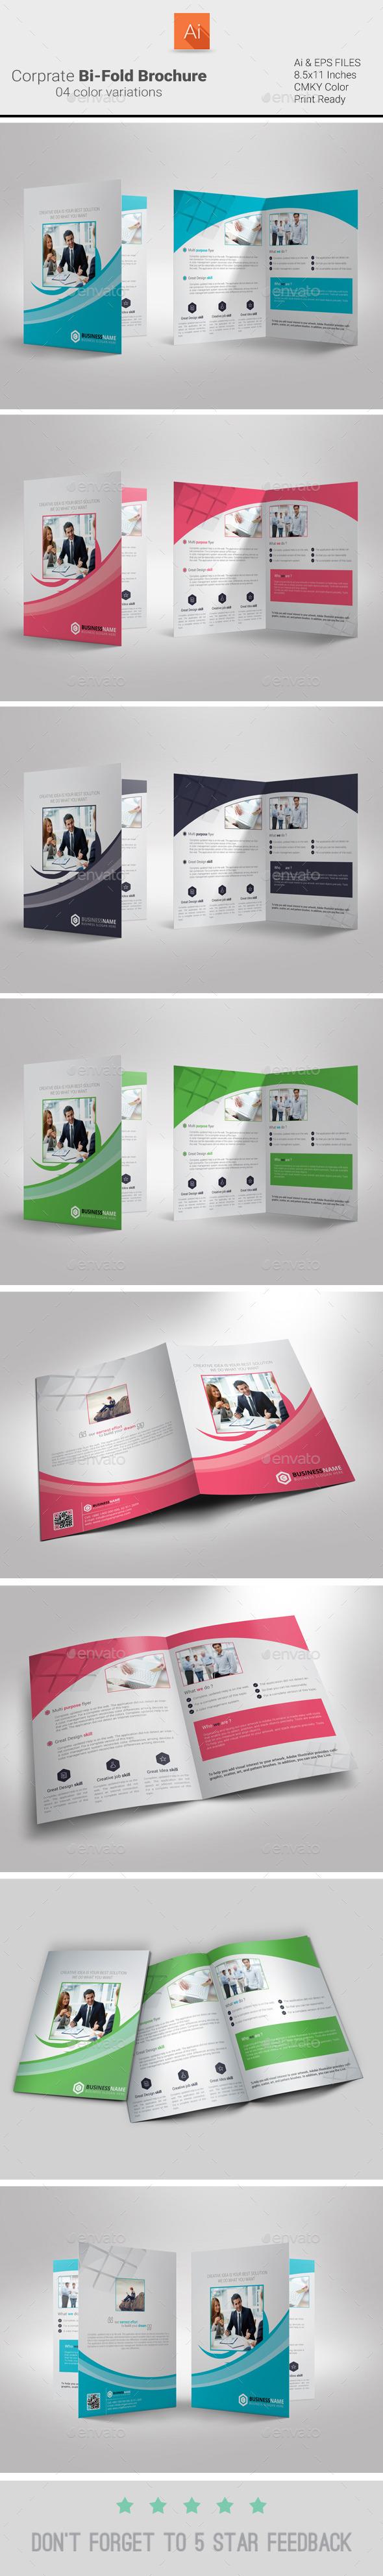 GraphicRiver Corporate Bi-Fold Brochure 9304010